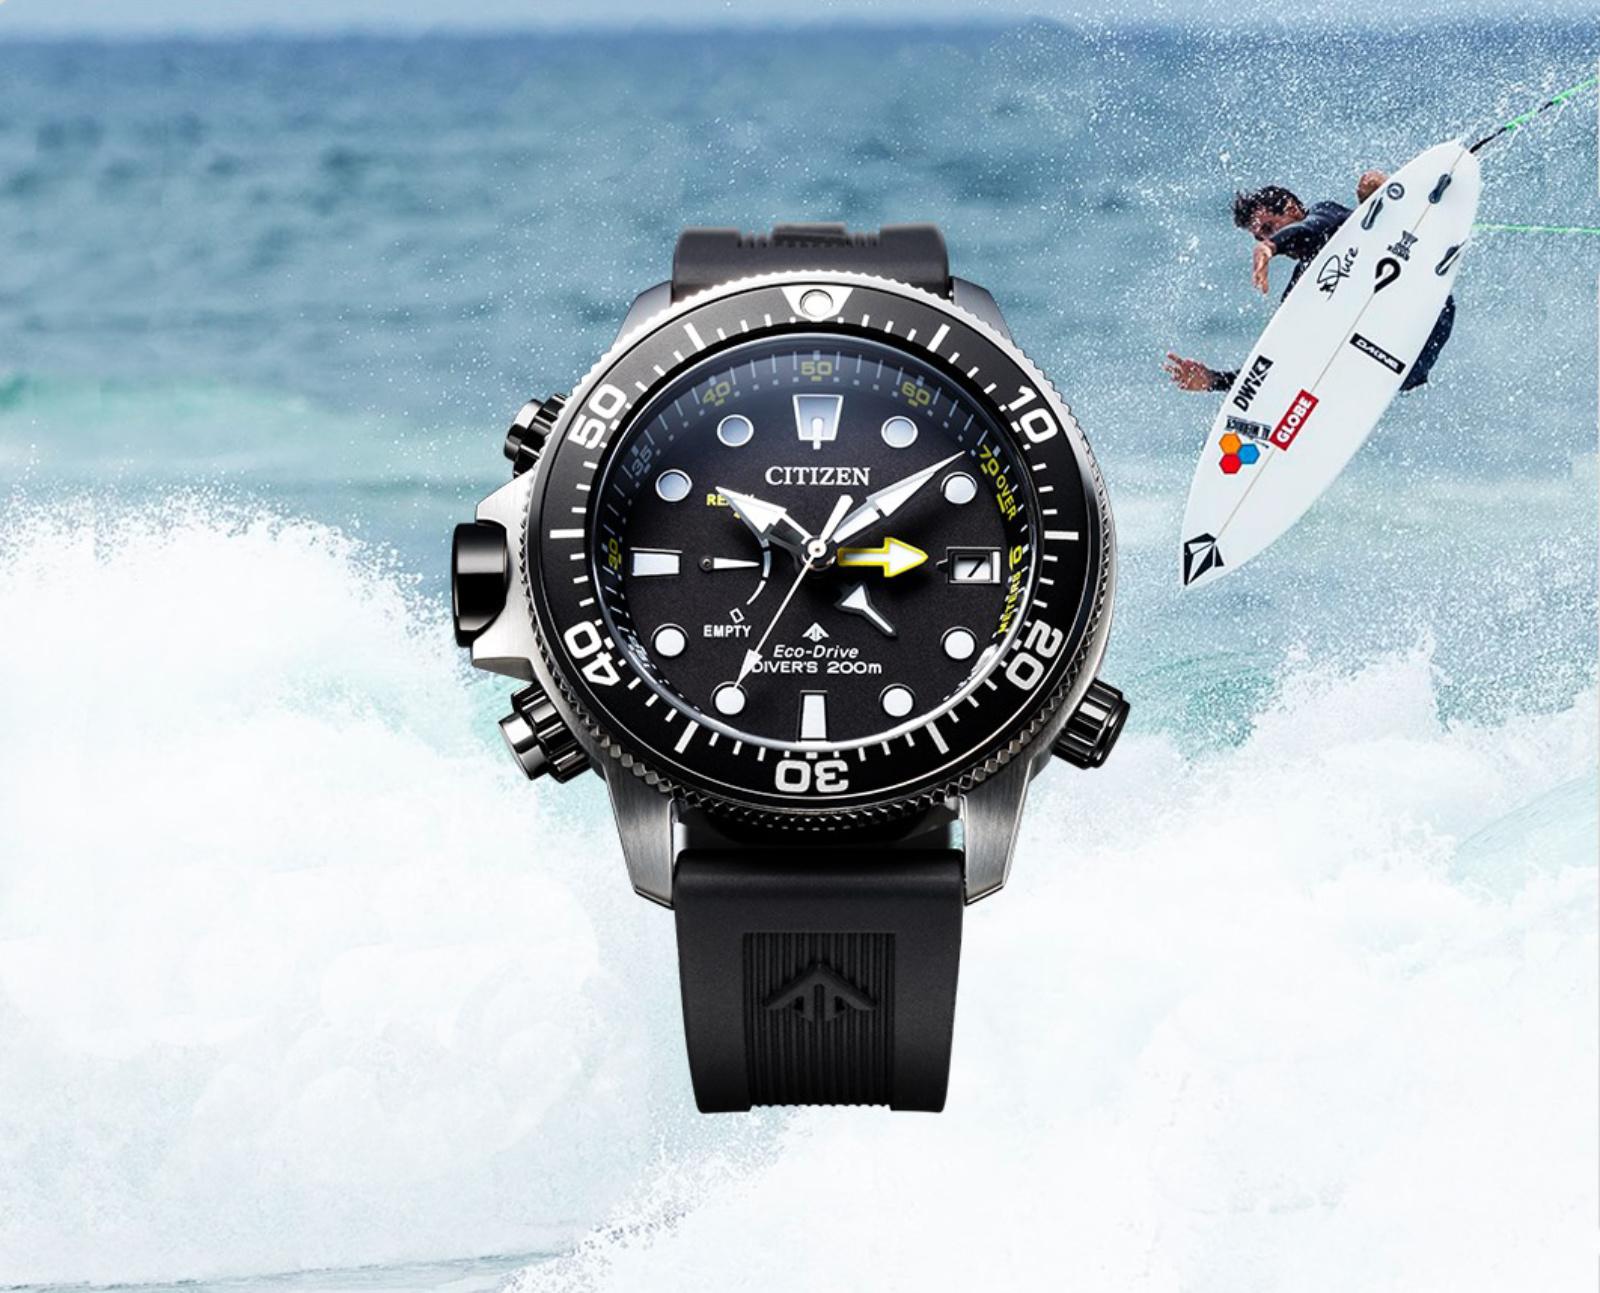 Horlogemerken van WatchXL Citizen merkhorloge Citizen Aqualand WatchXL.